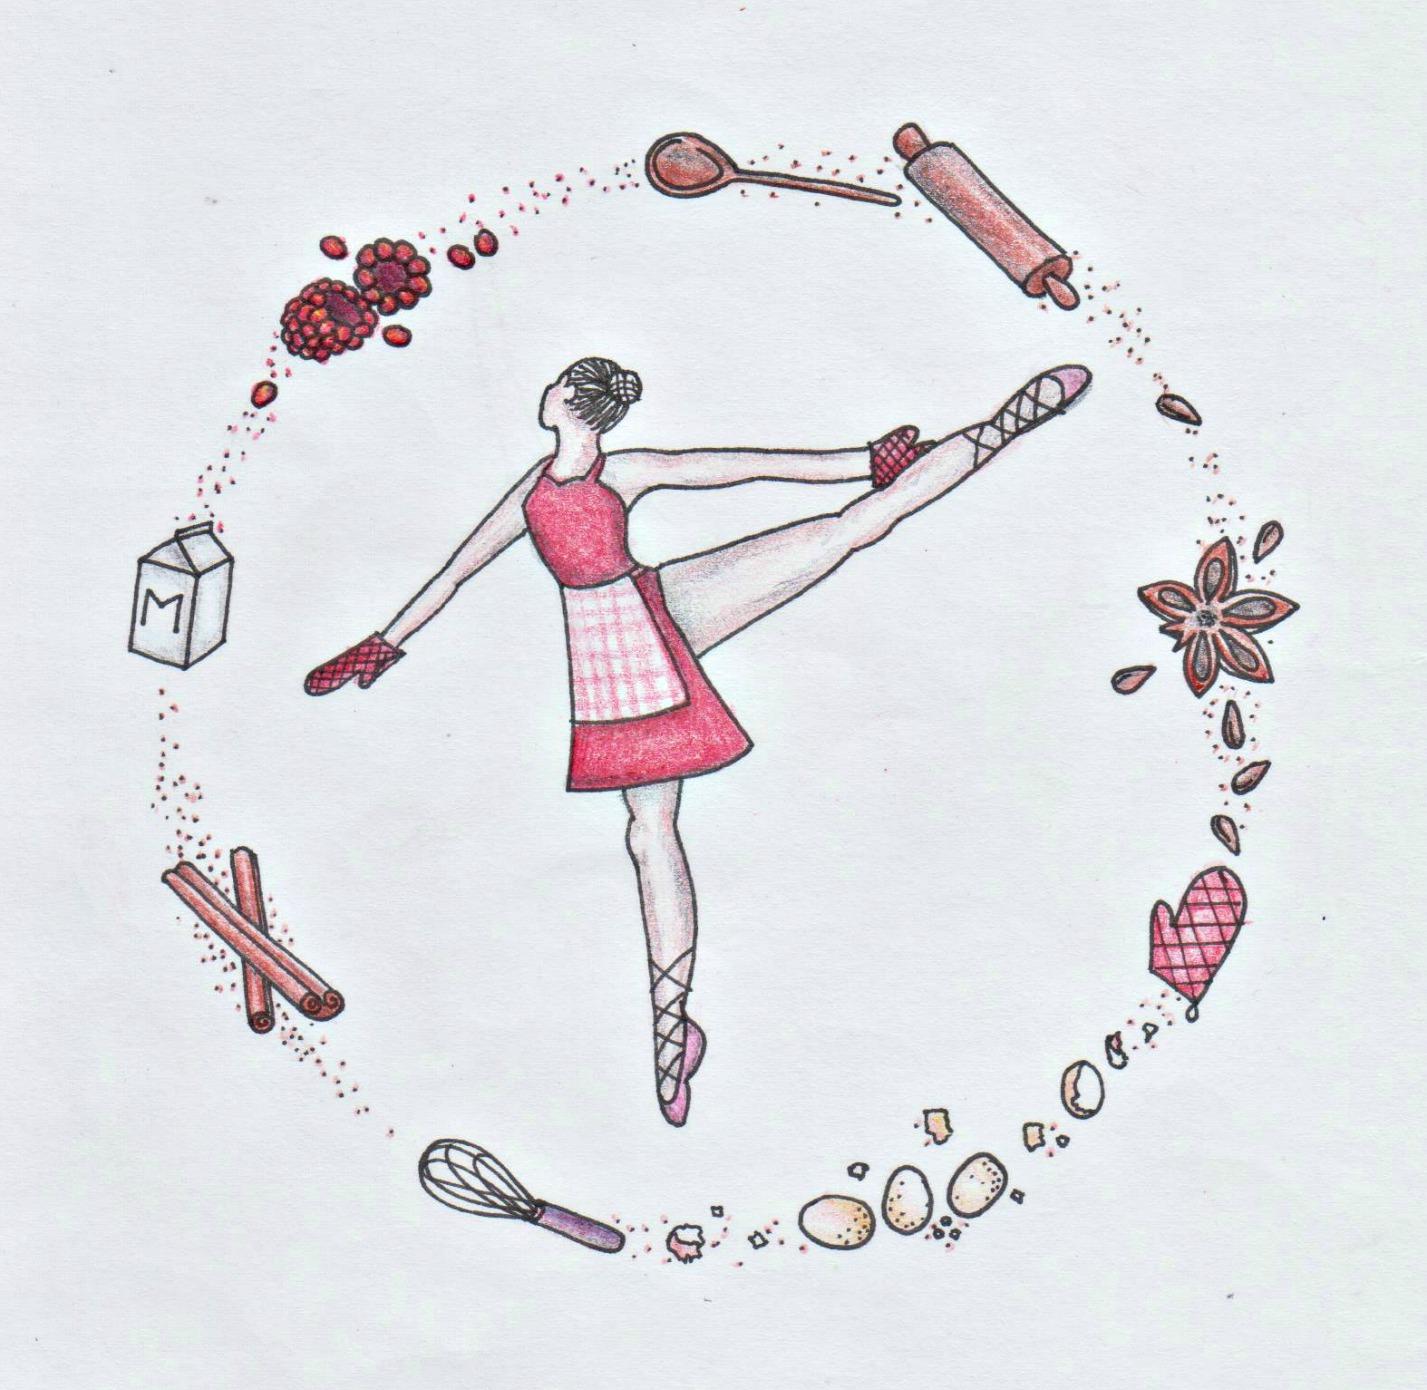 Madelyn's Milk poem illustration